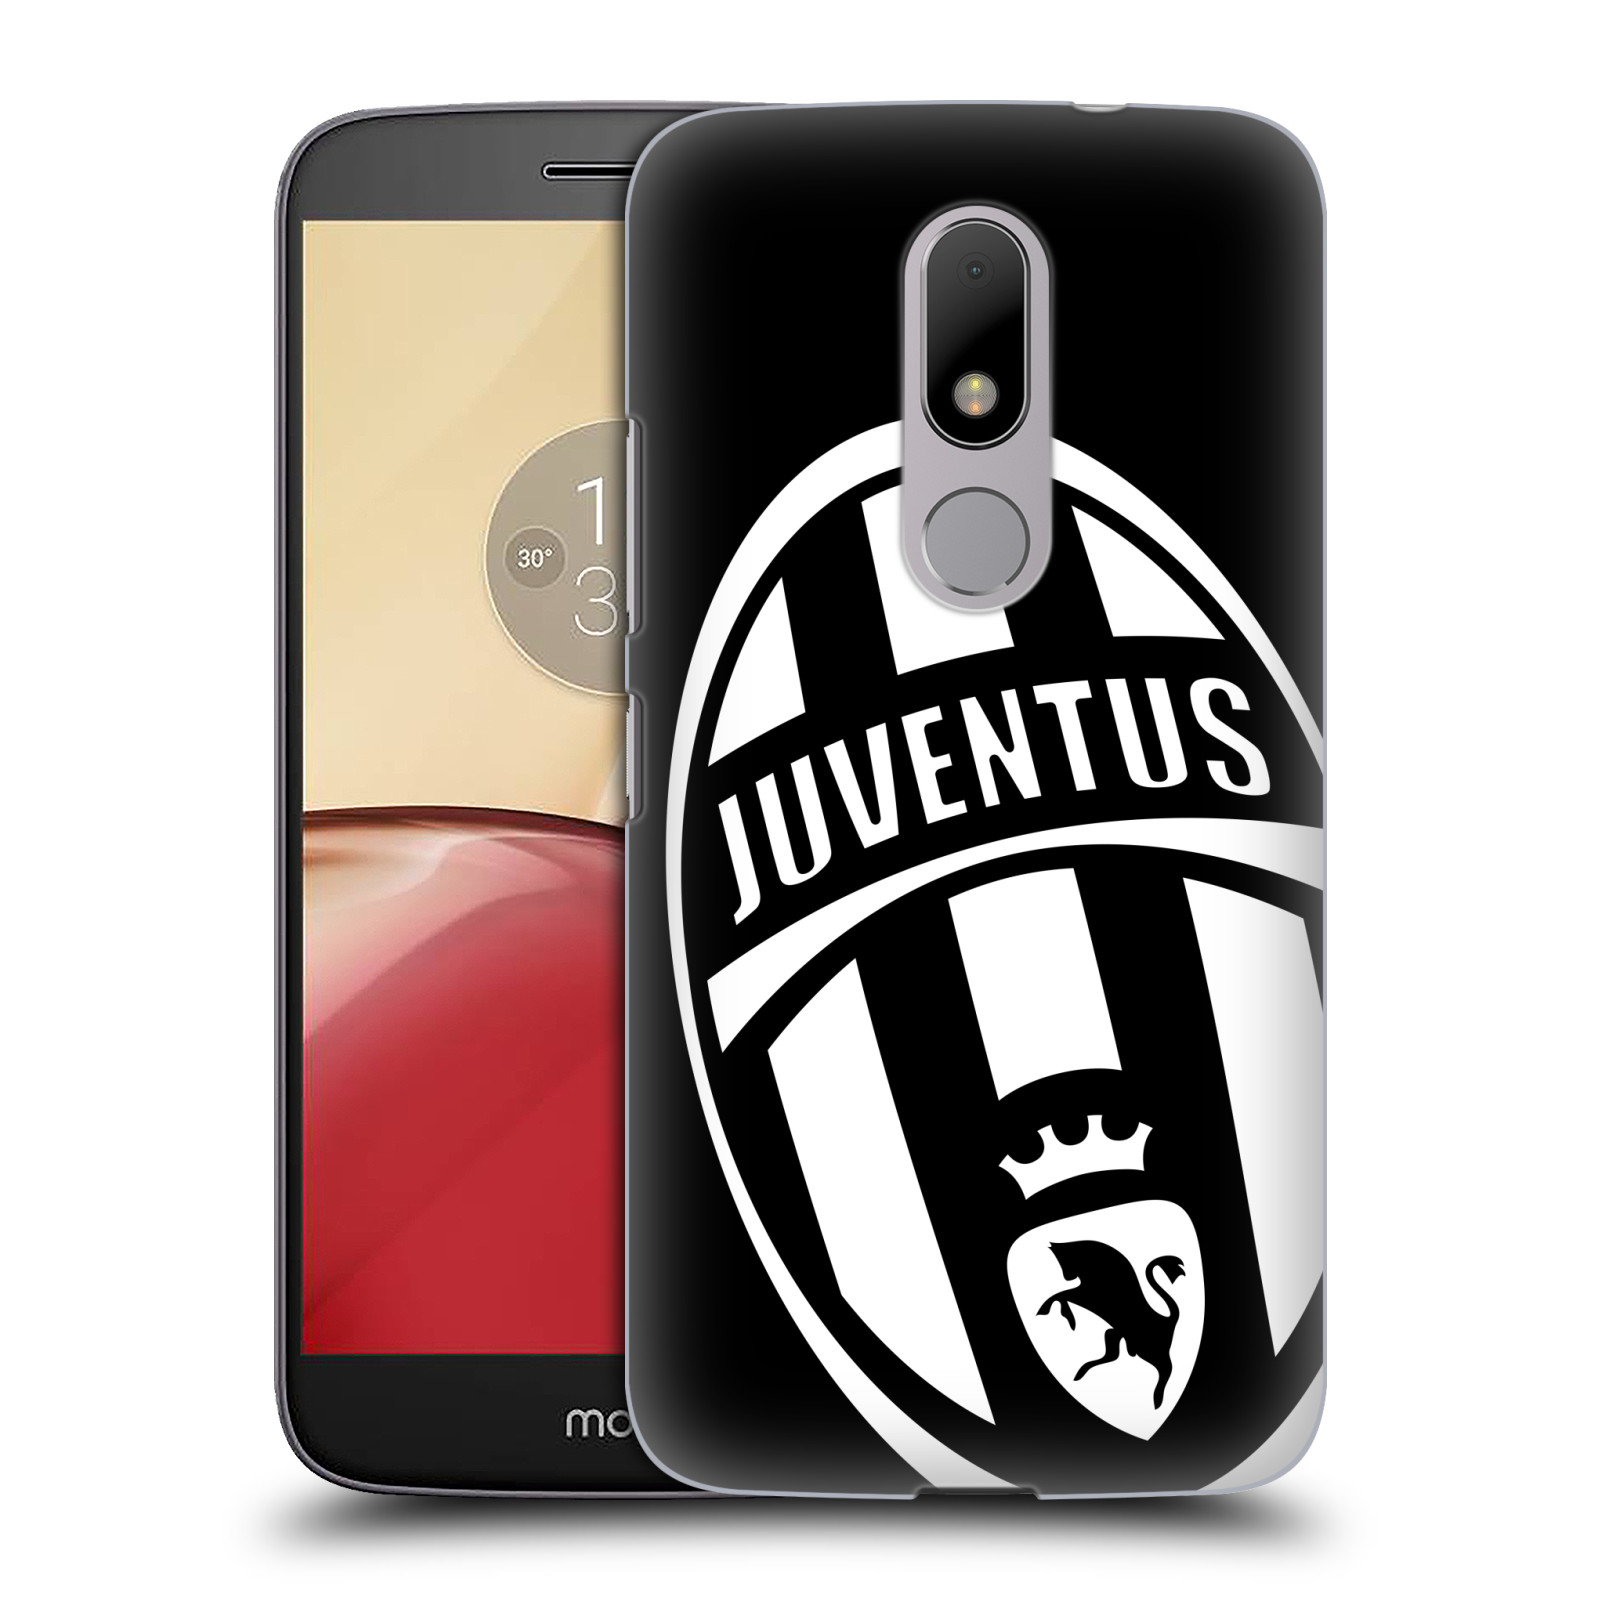 Plastové pouzdro na mobil Lenovo Moto M HEAD CASE Juventus FC - Velké Logo (Plastový kryt či obal na mobilní telefon Juventus FC Official pro Lenovo (Motorola) Moto M / Moto M Dual SIM)